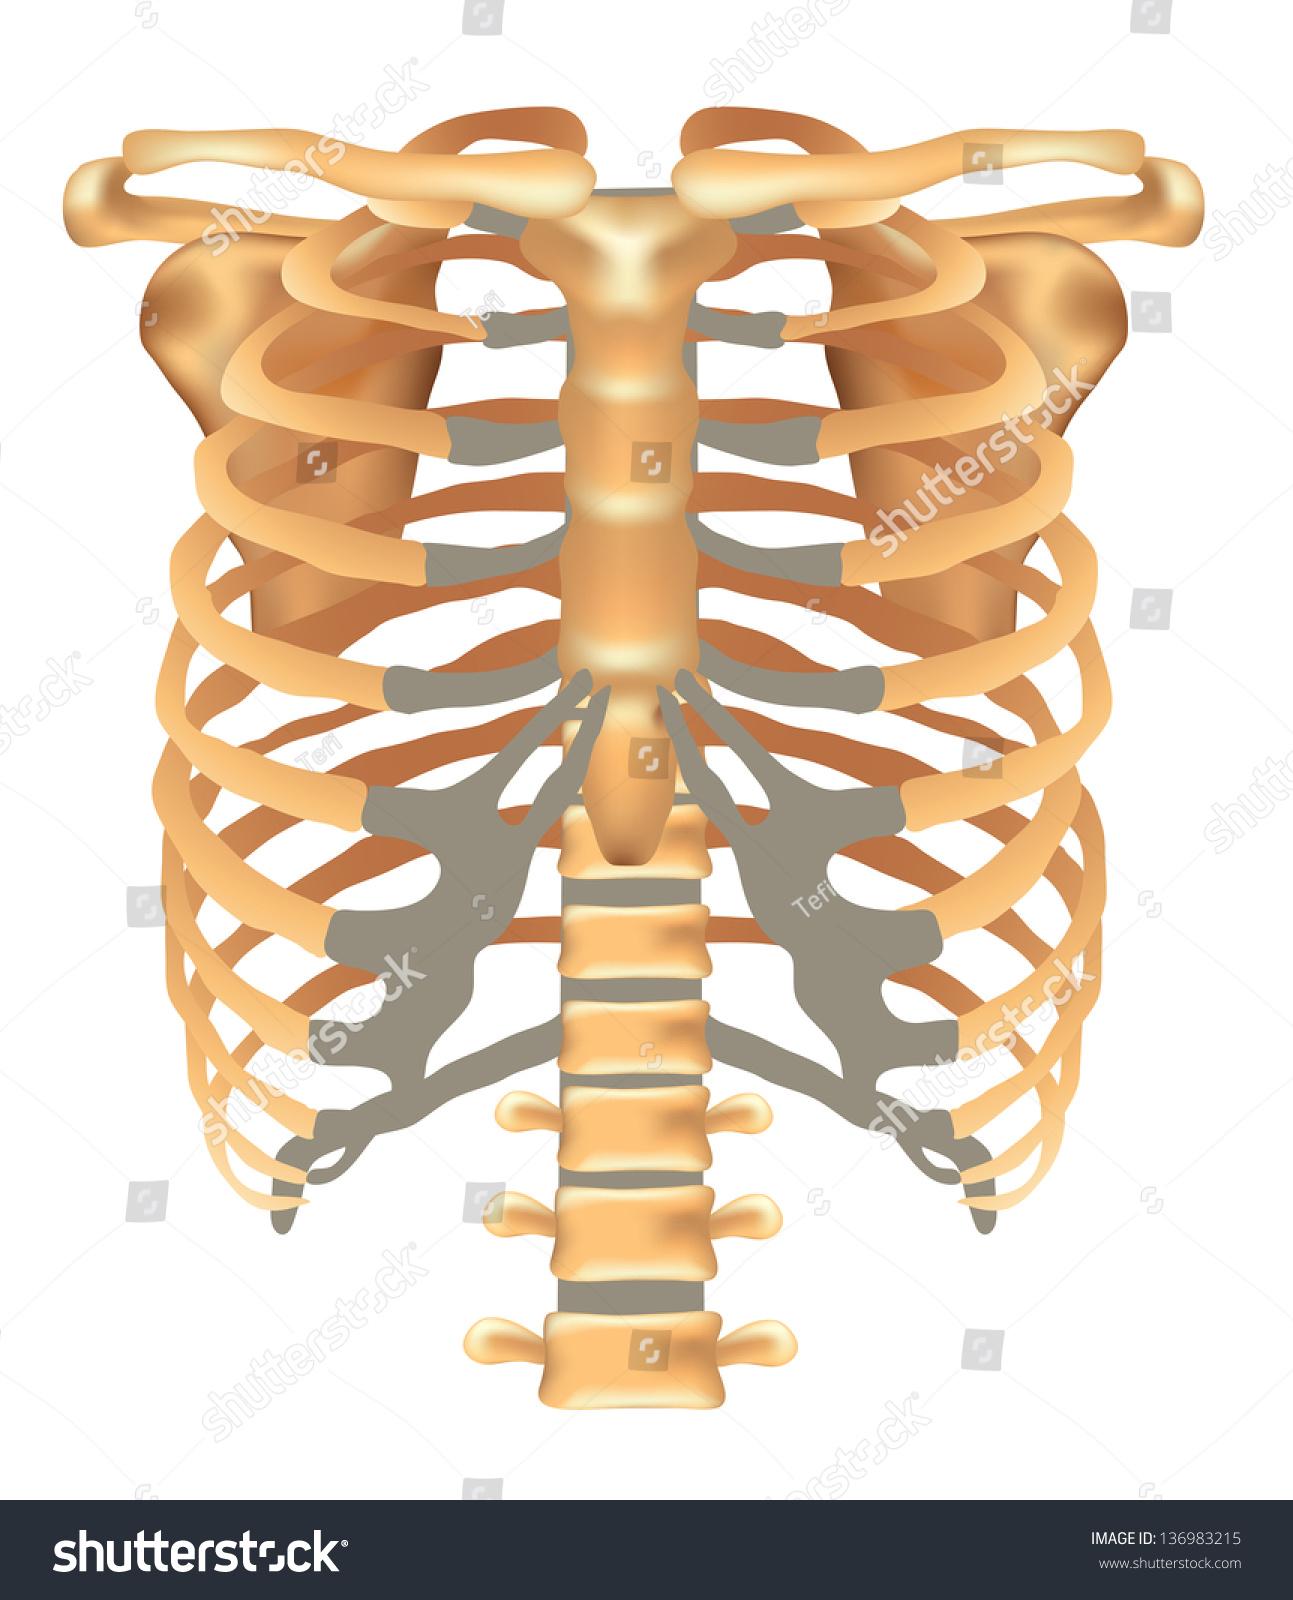 clavicle and scapula diagram venn fiction vs nonfiction thorax ribs sternum vertebral stock